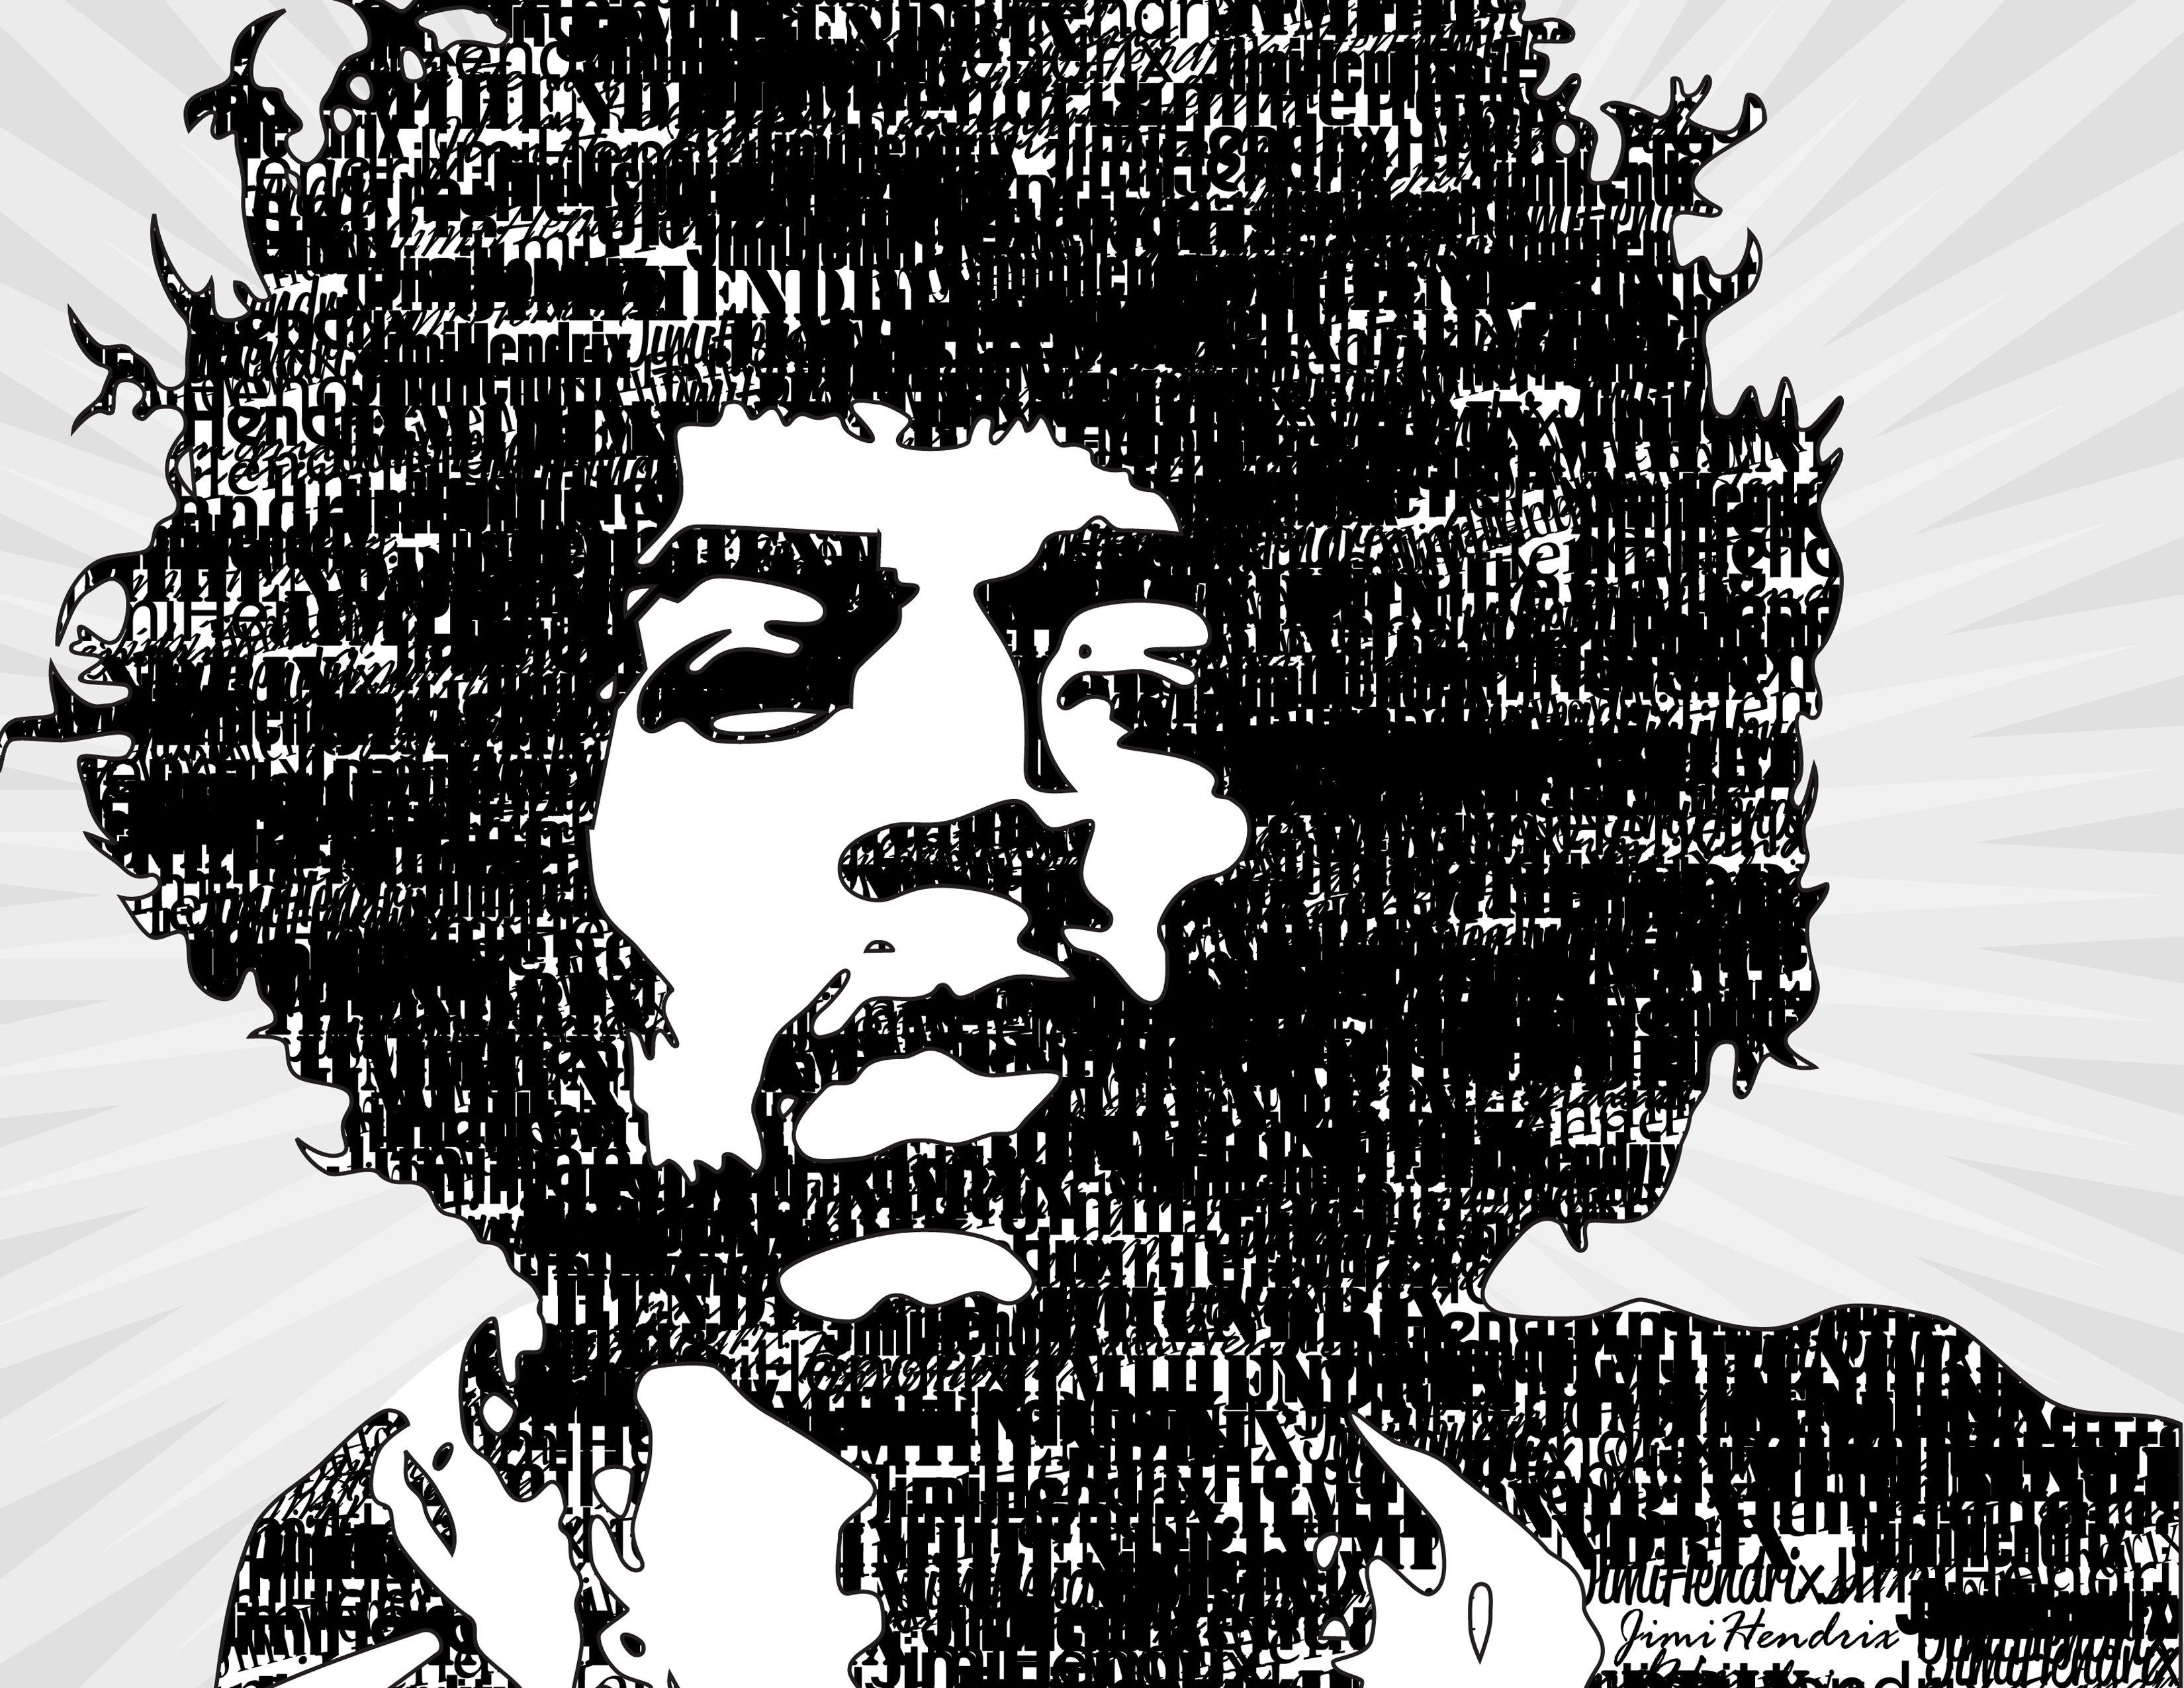 Jimi Hendrix Wallpaper Jimi hendrix, Wallpapers de